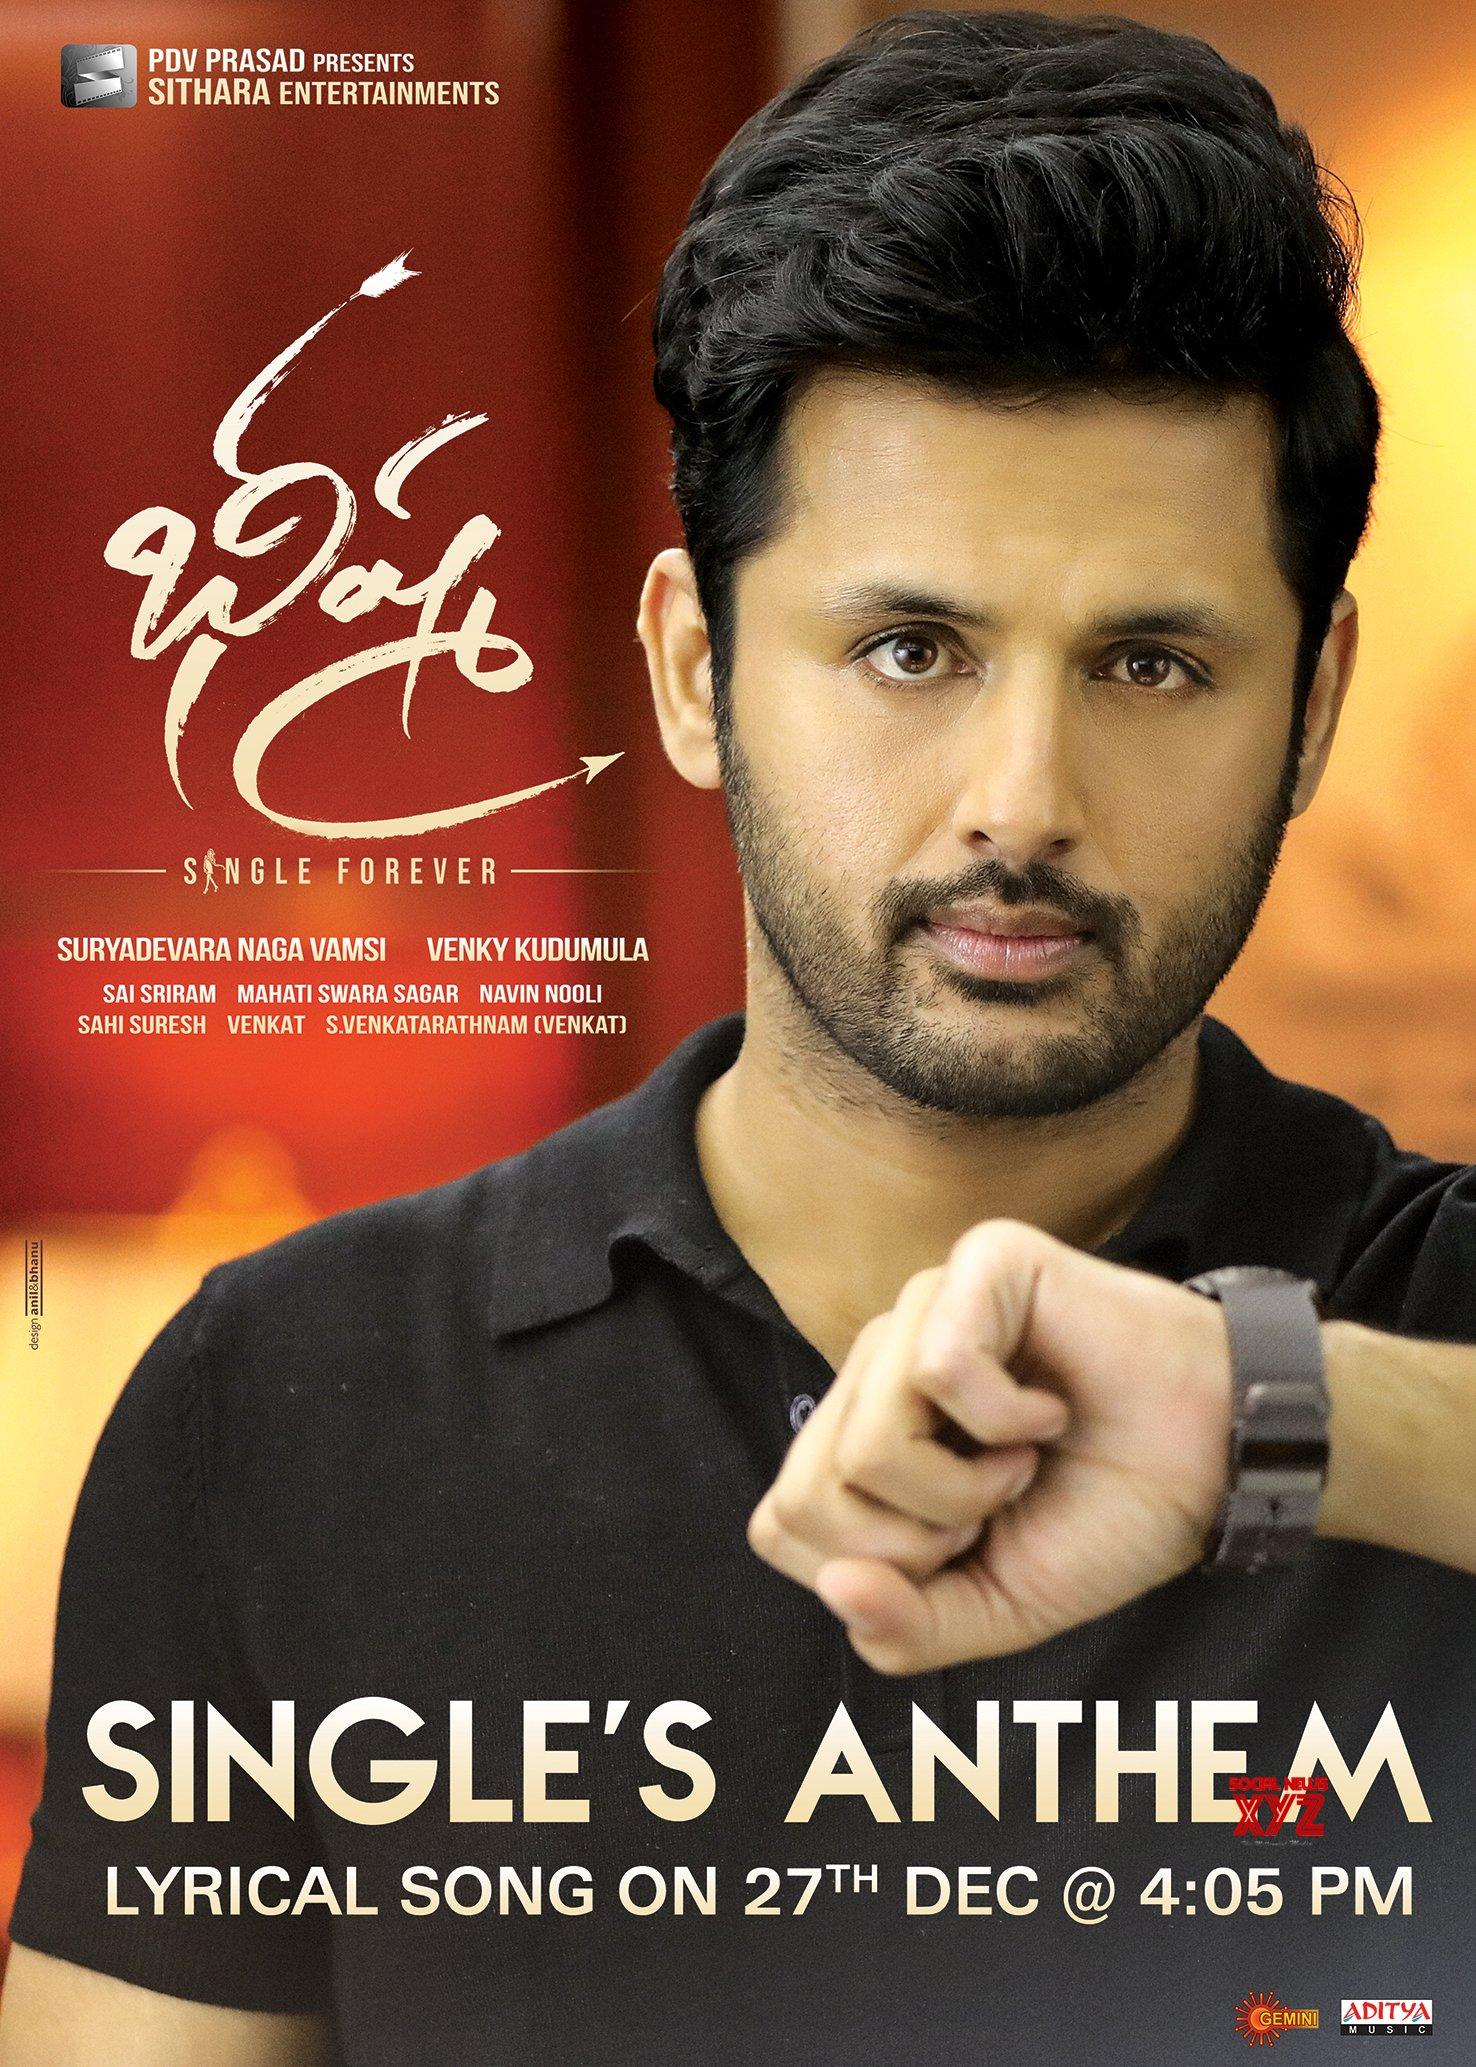 Bheeshma Movie First Single Launched Social News Xyz